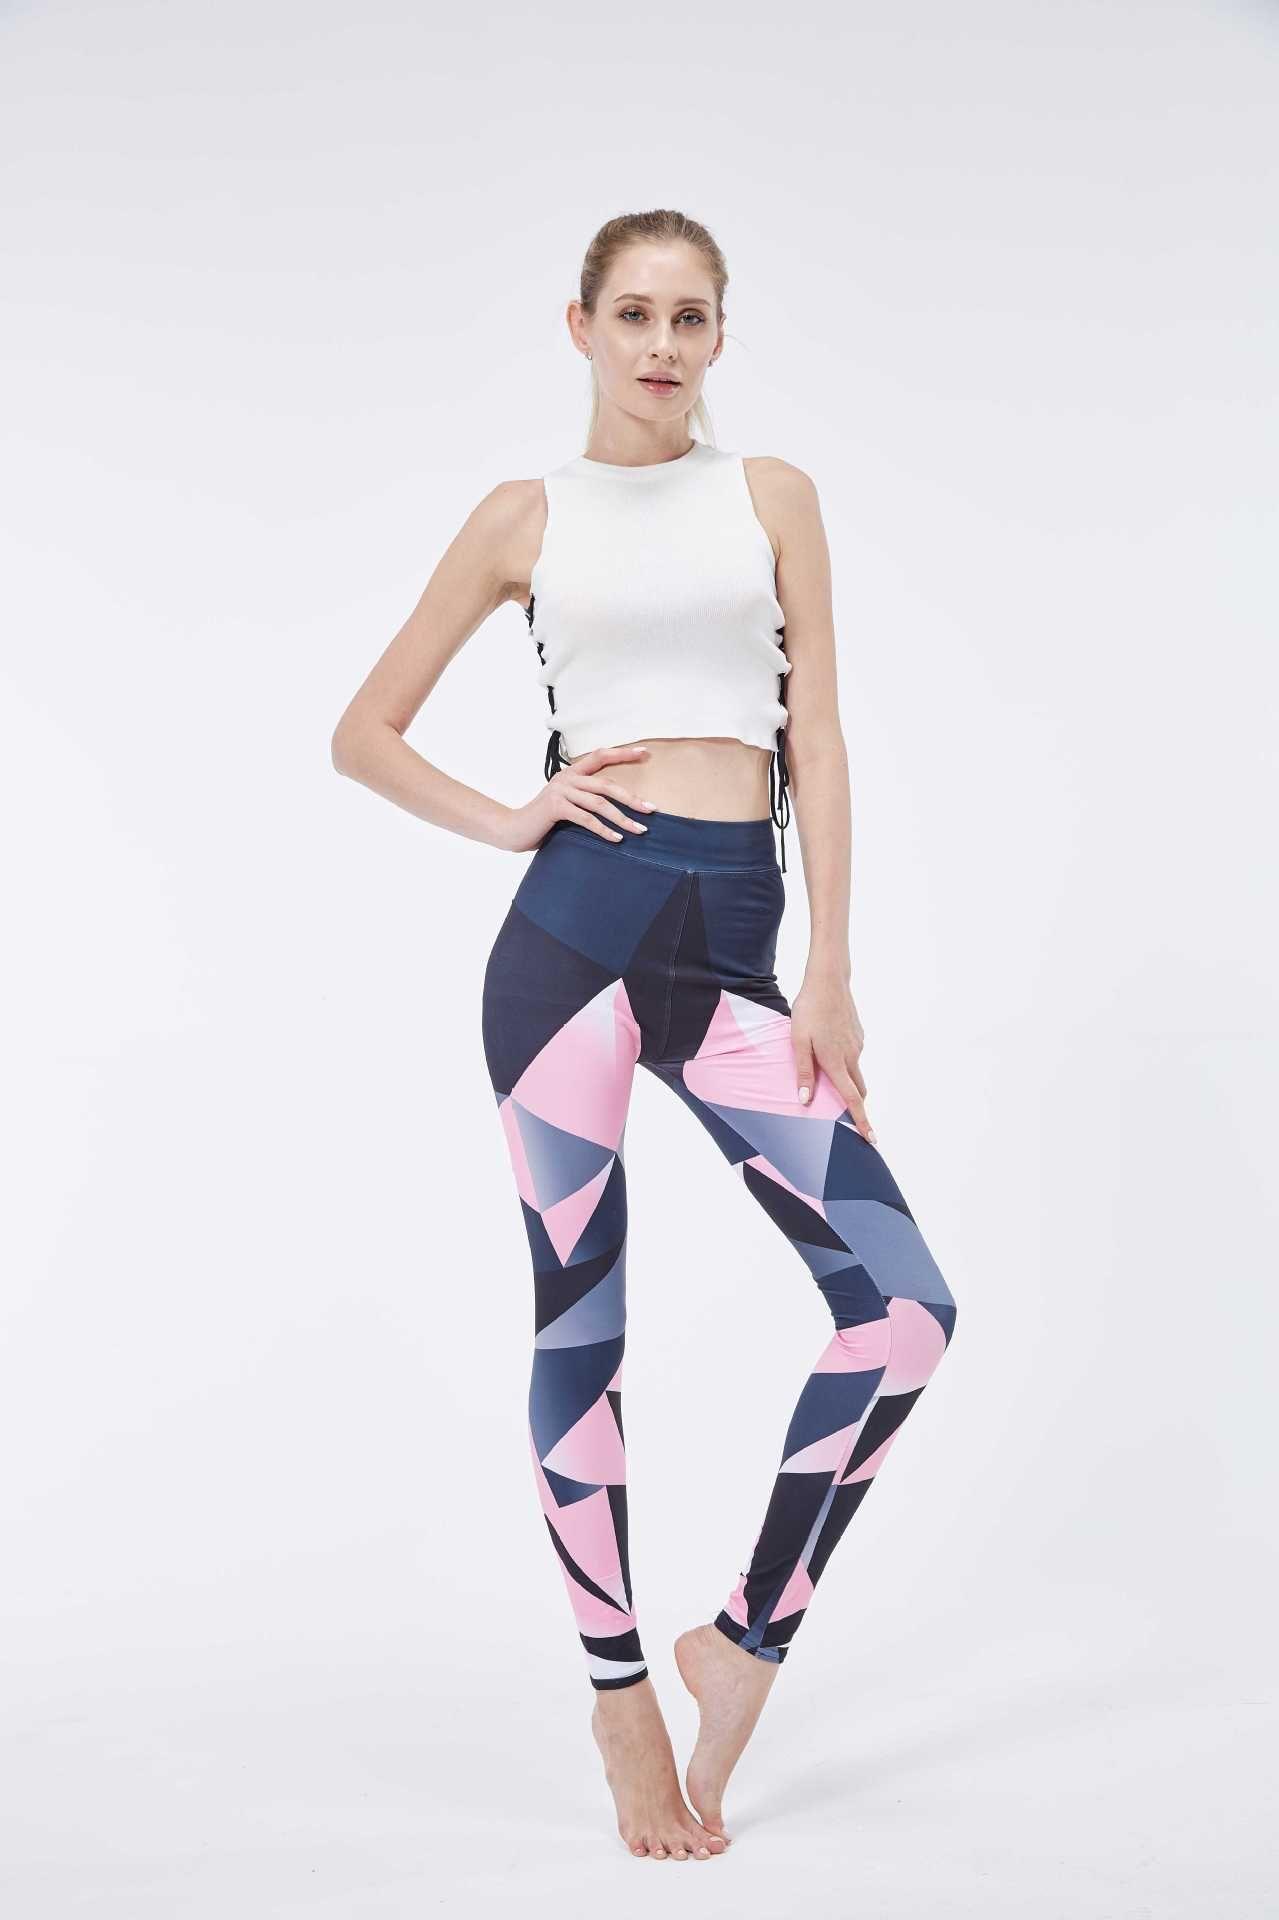 96af14437d84 2019 New Arrival Women's Printed Leggings Fashion High Waist Printed ...